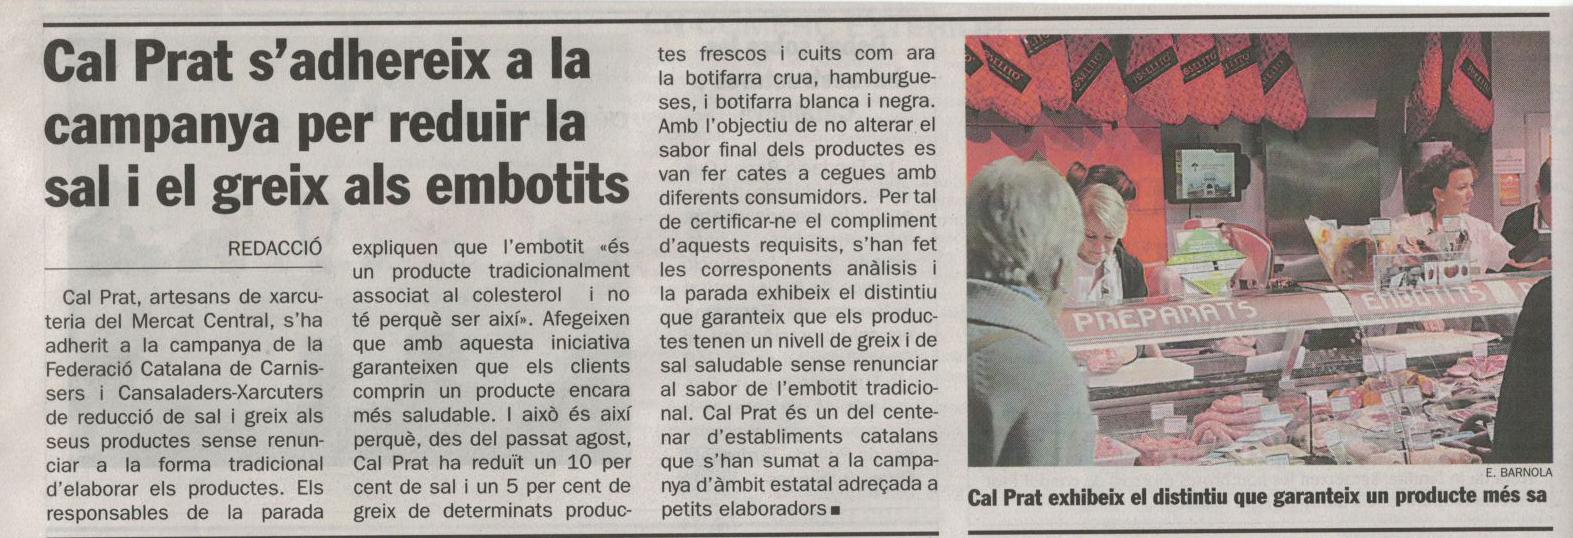 cal_prat_sal_greix